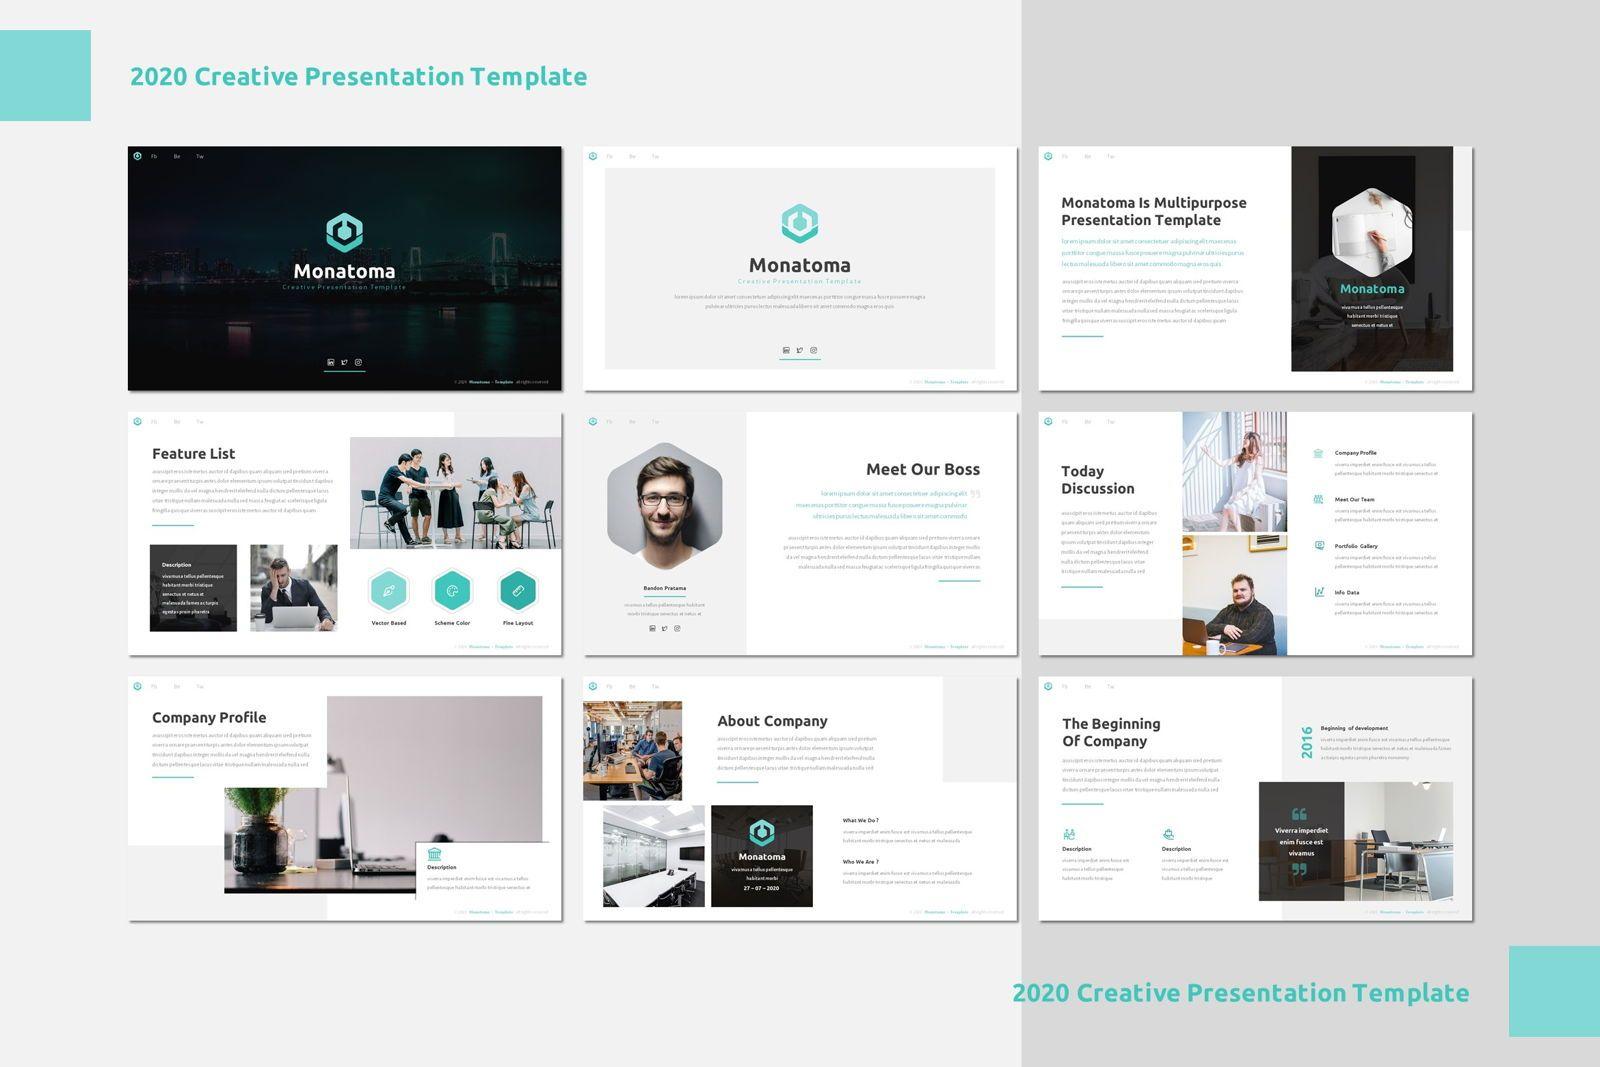 Monatoma - Powerpoint Template, Slide 2, 07779, Presentation Templates — PoweredTemplate.com